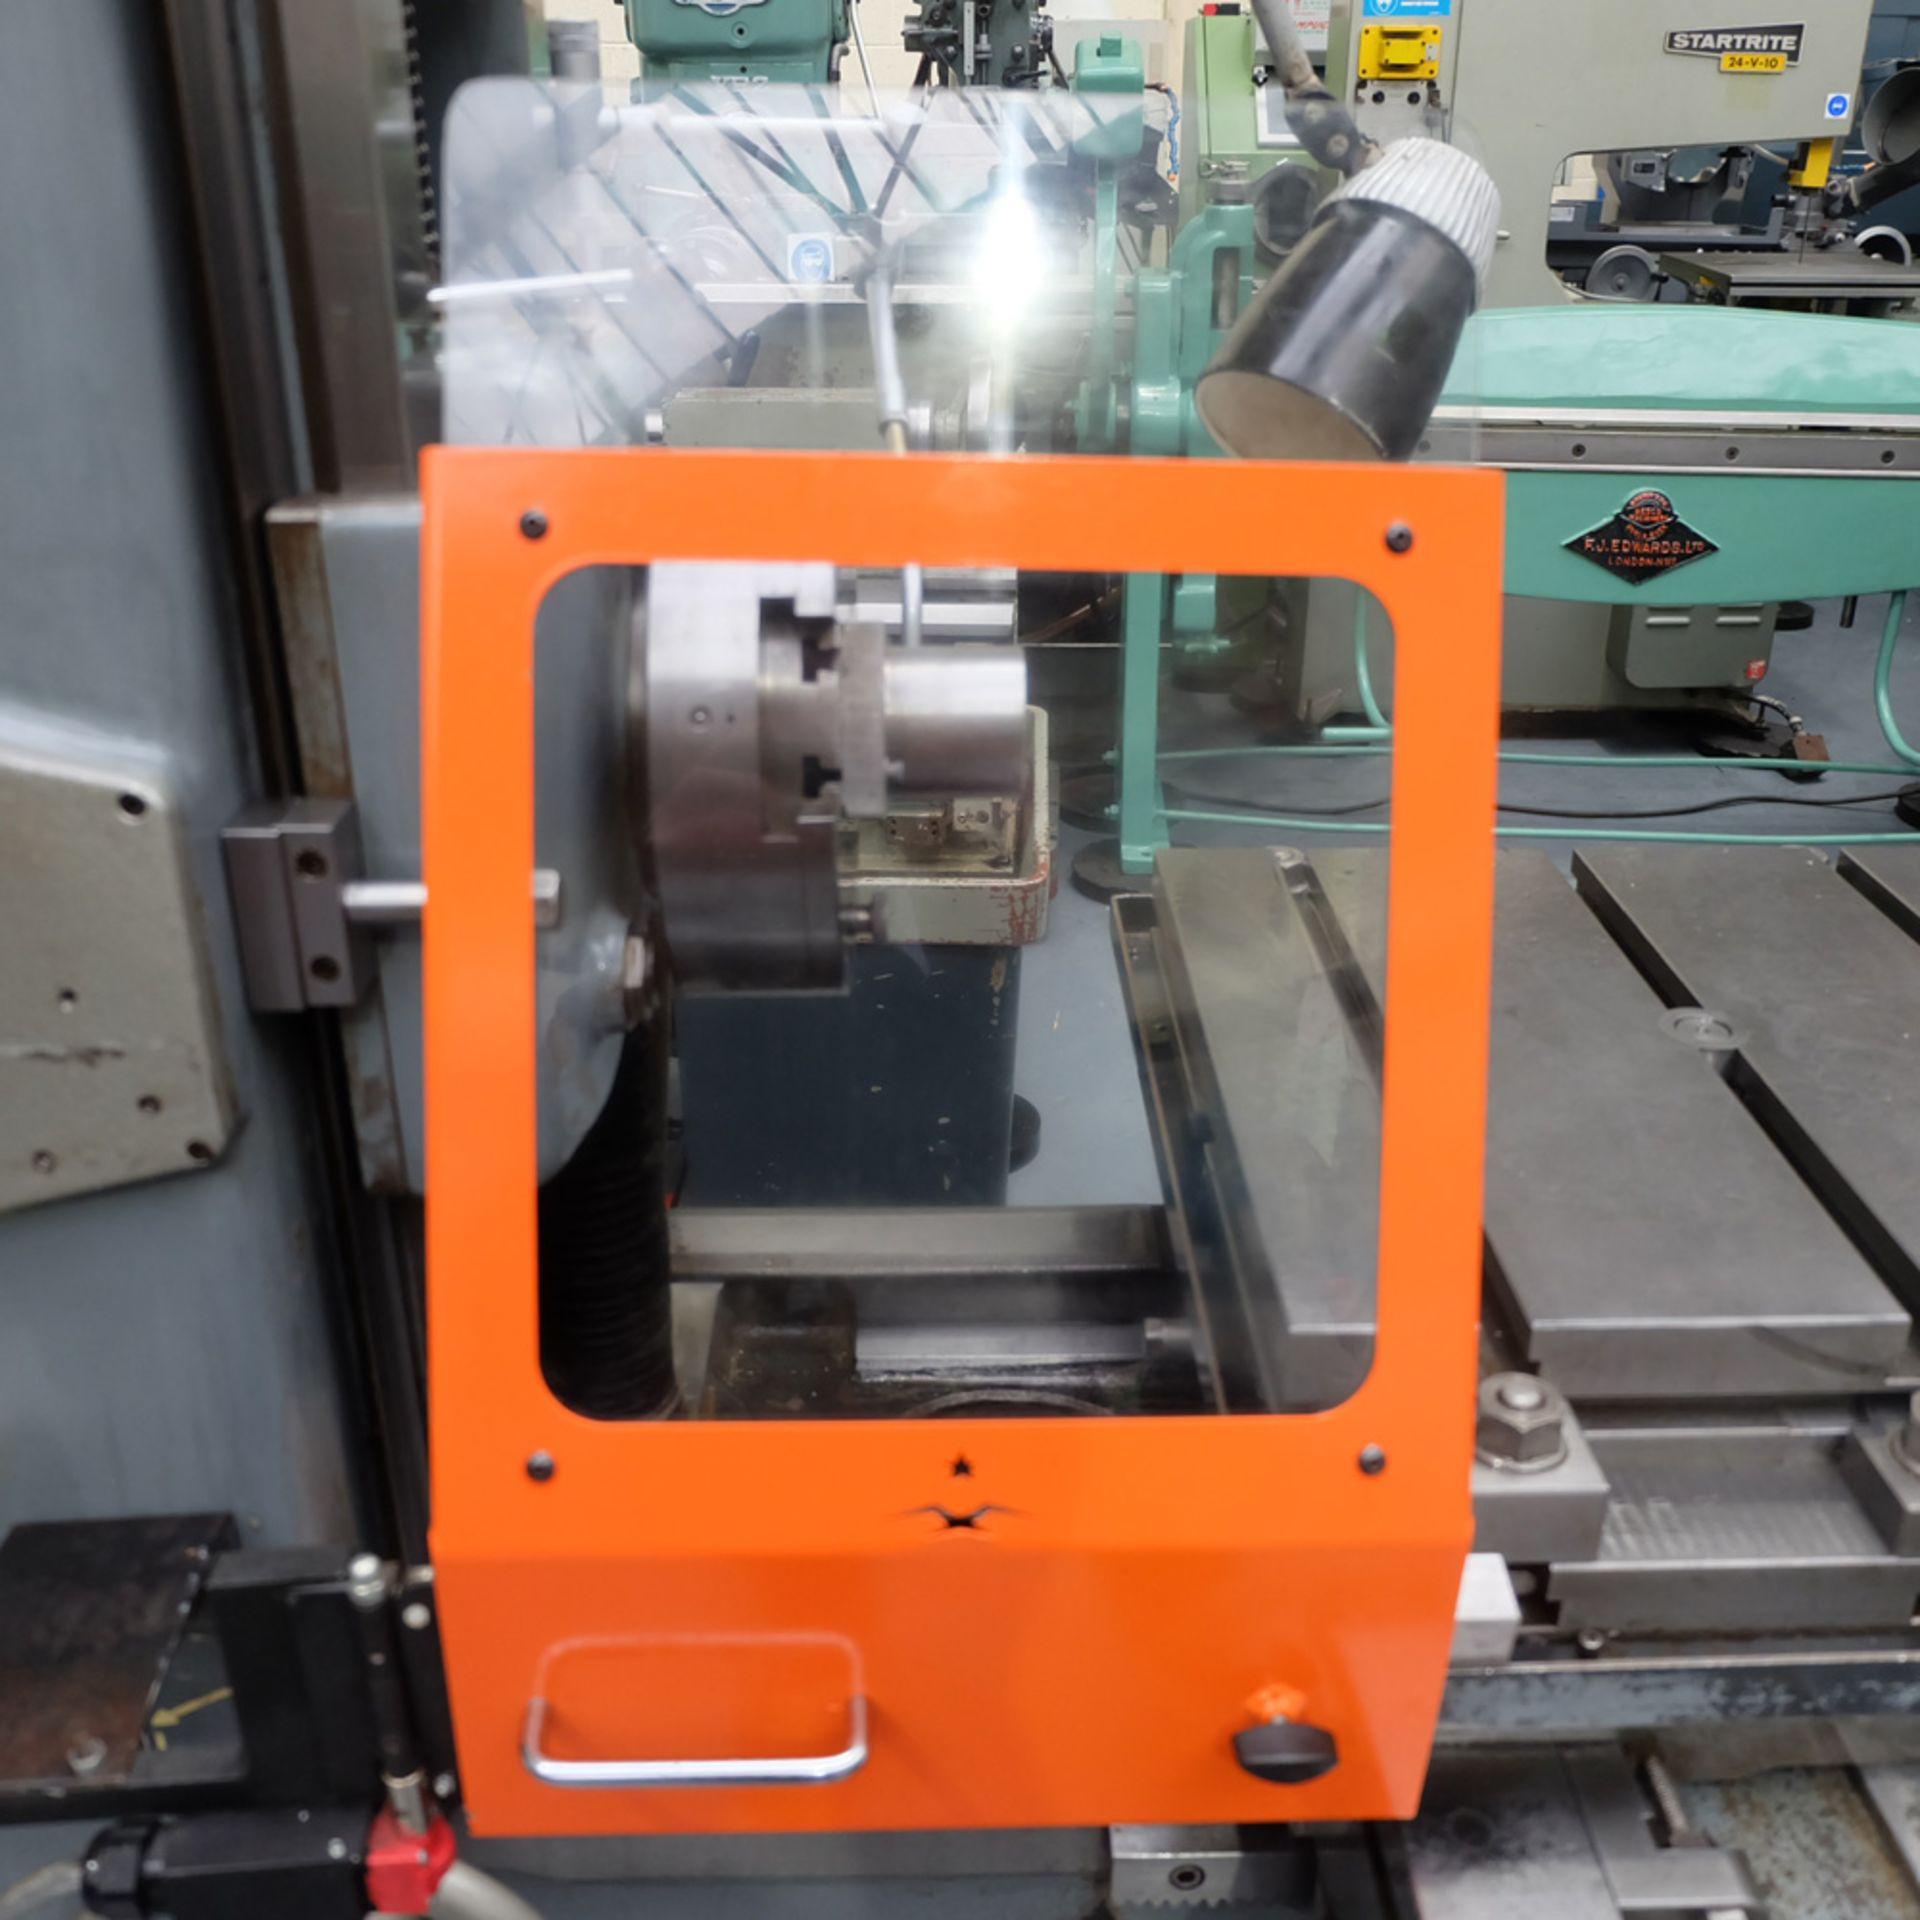 "Kearns S Type Facing Chuck Model Horizontal Boring Machine. Facing Chuck Capacity 8"". - Image 18 of 18"